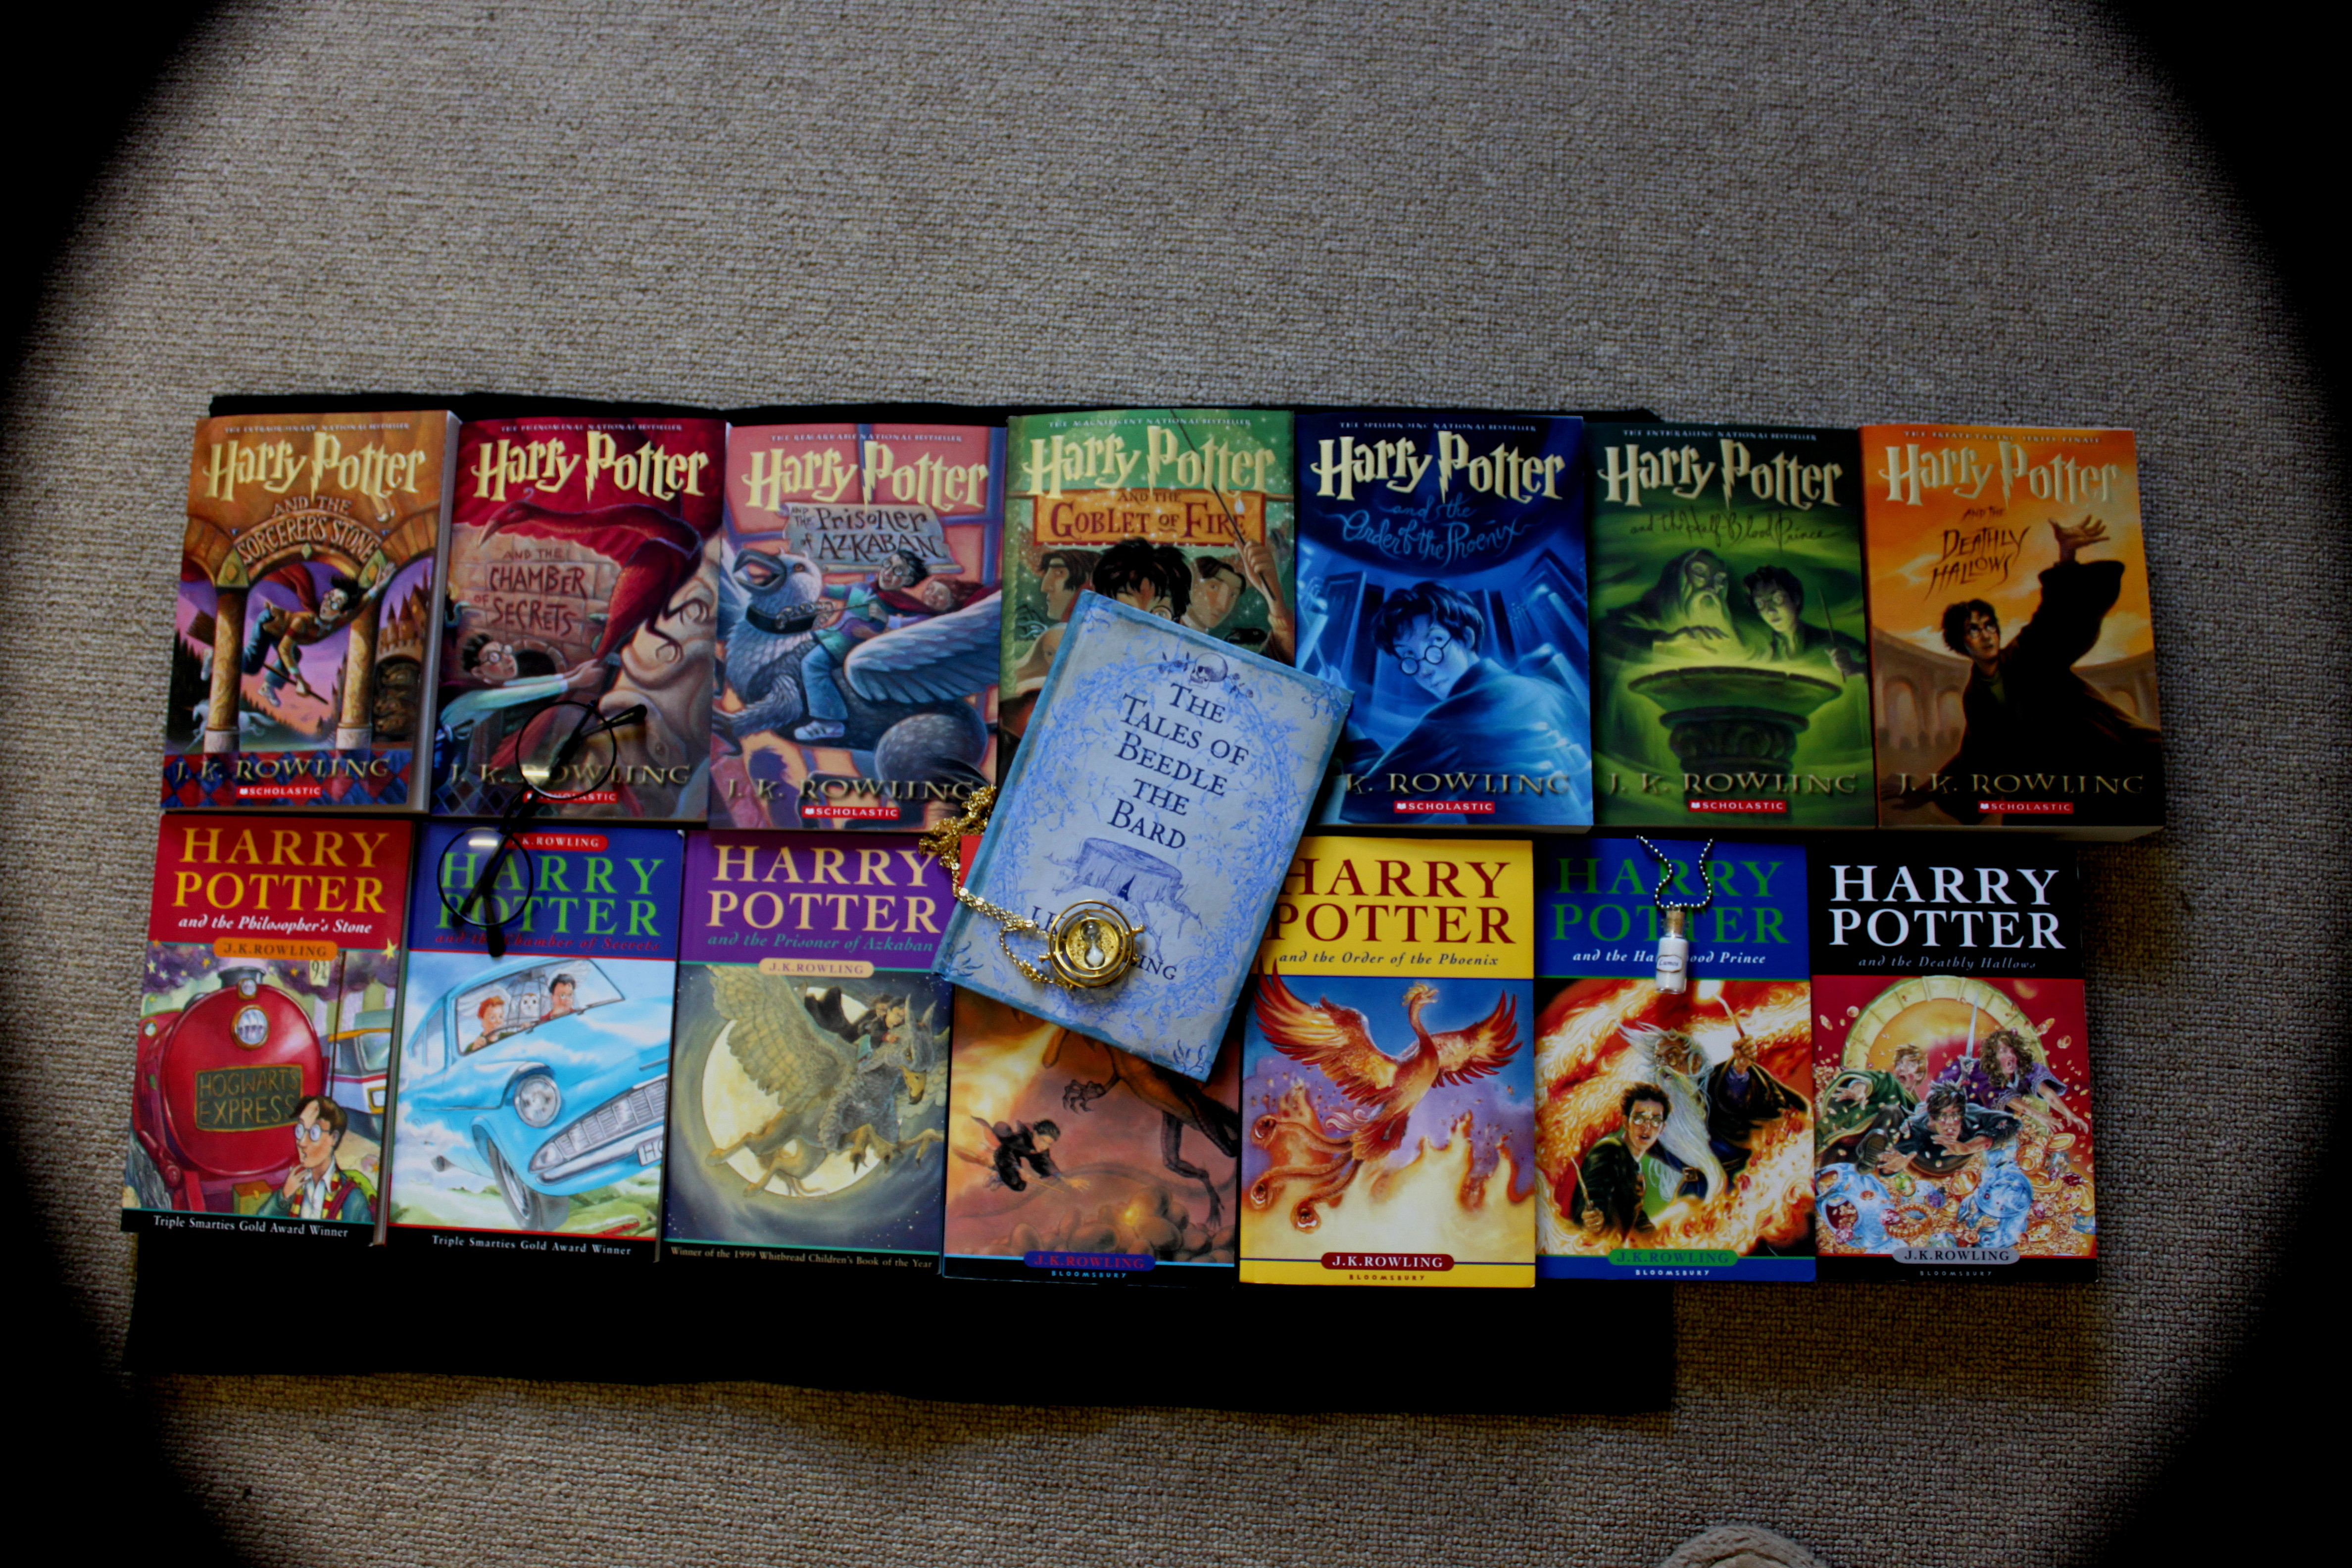 "<p>Книги о Гарри Поттере.&nbsp;Фото: &copy; Flickr/<a href=""https://www.flickr.com/photos/laurenashleigh/"">lozikiki</a></p>"